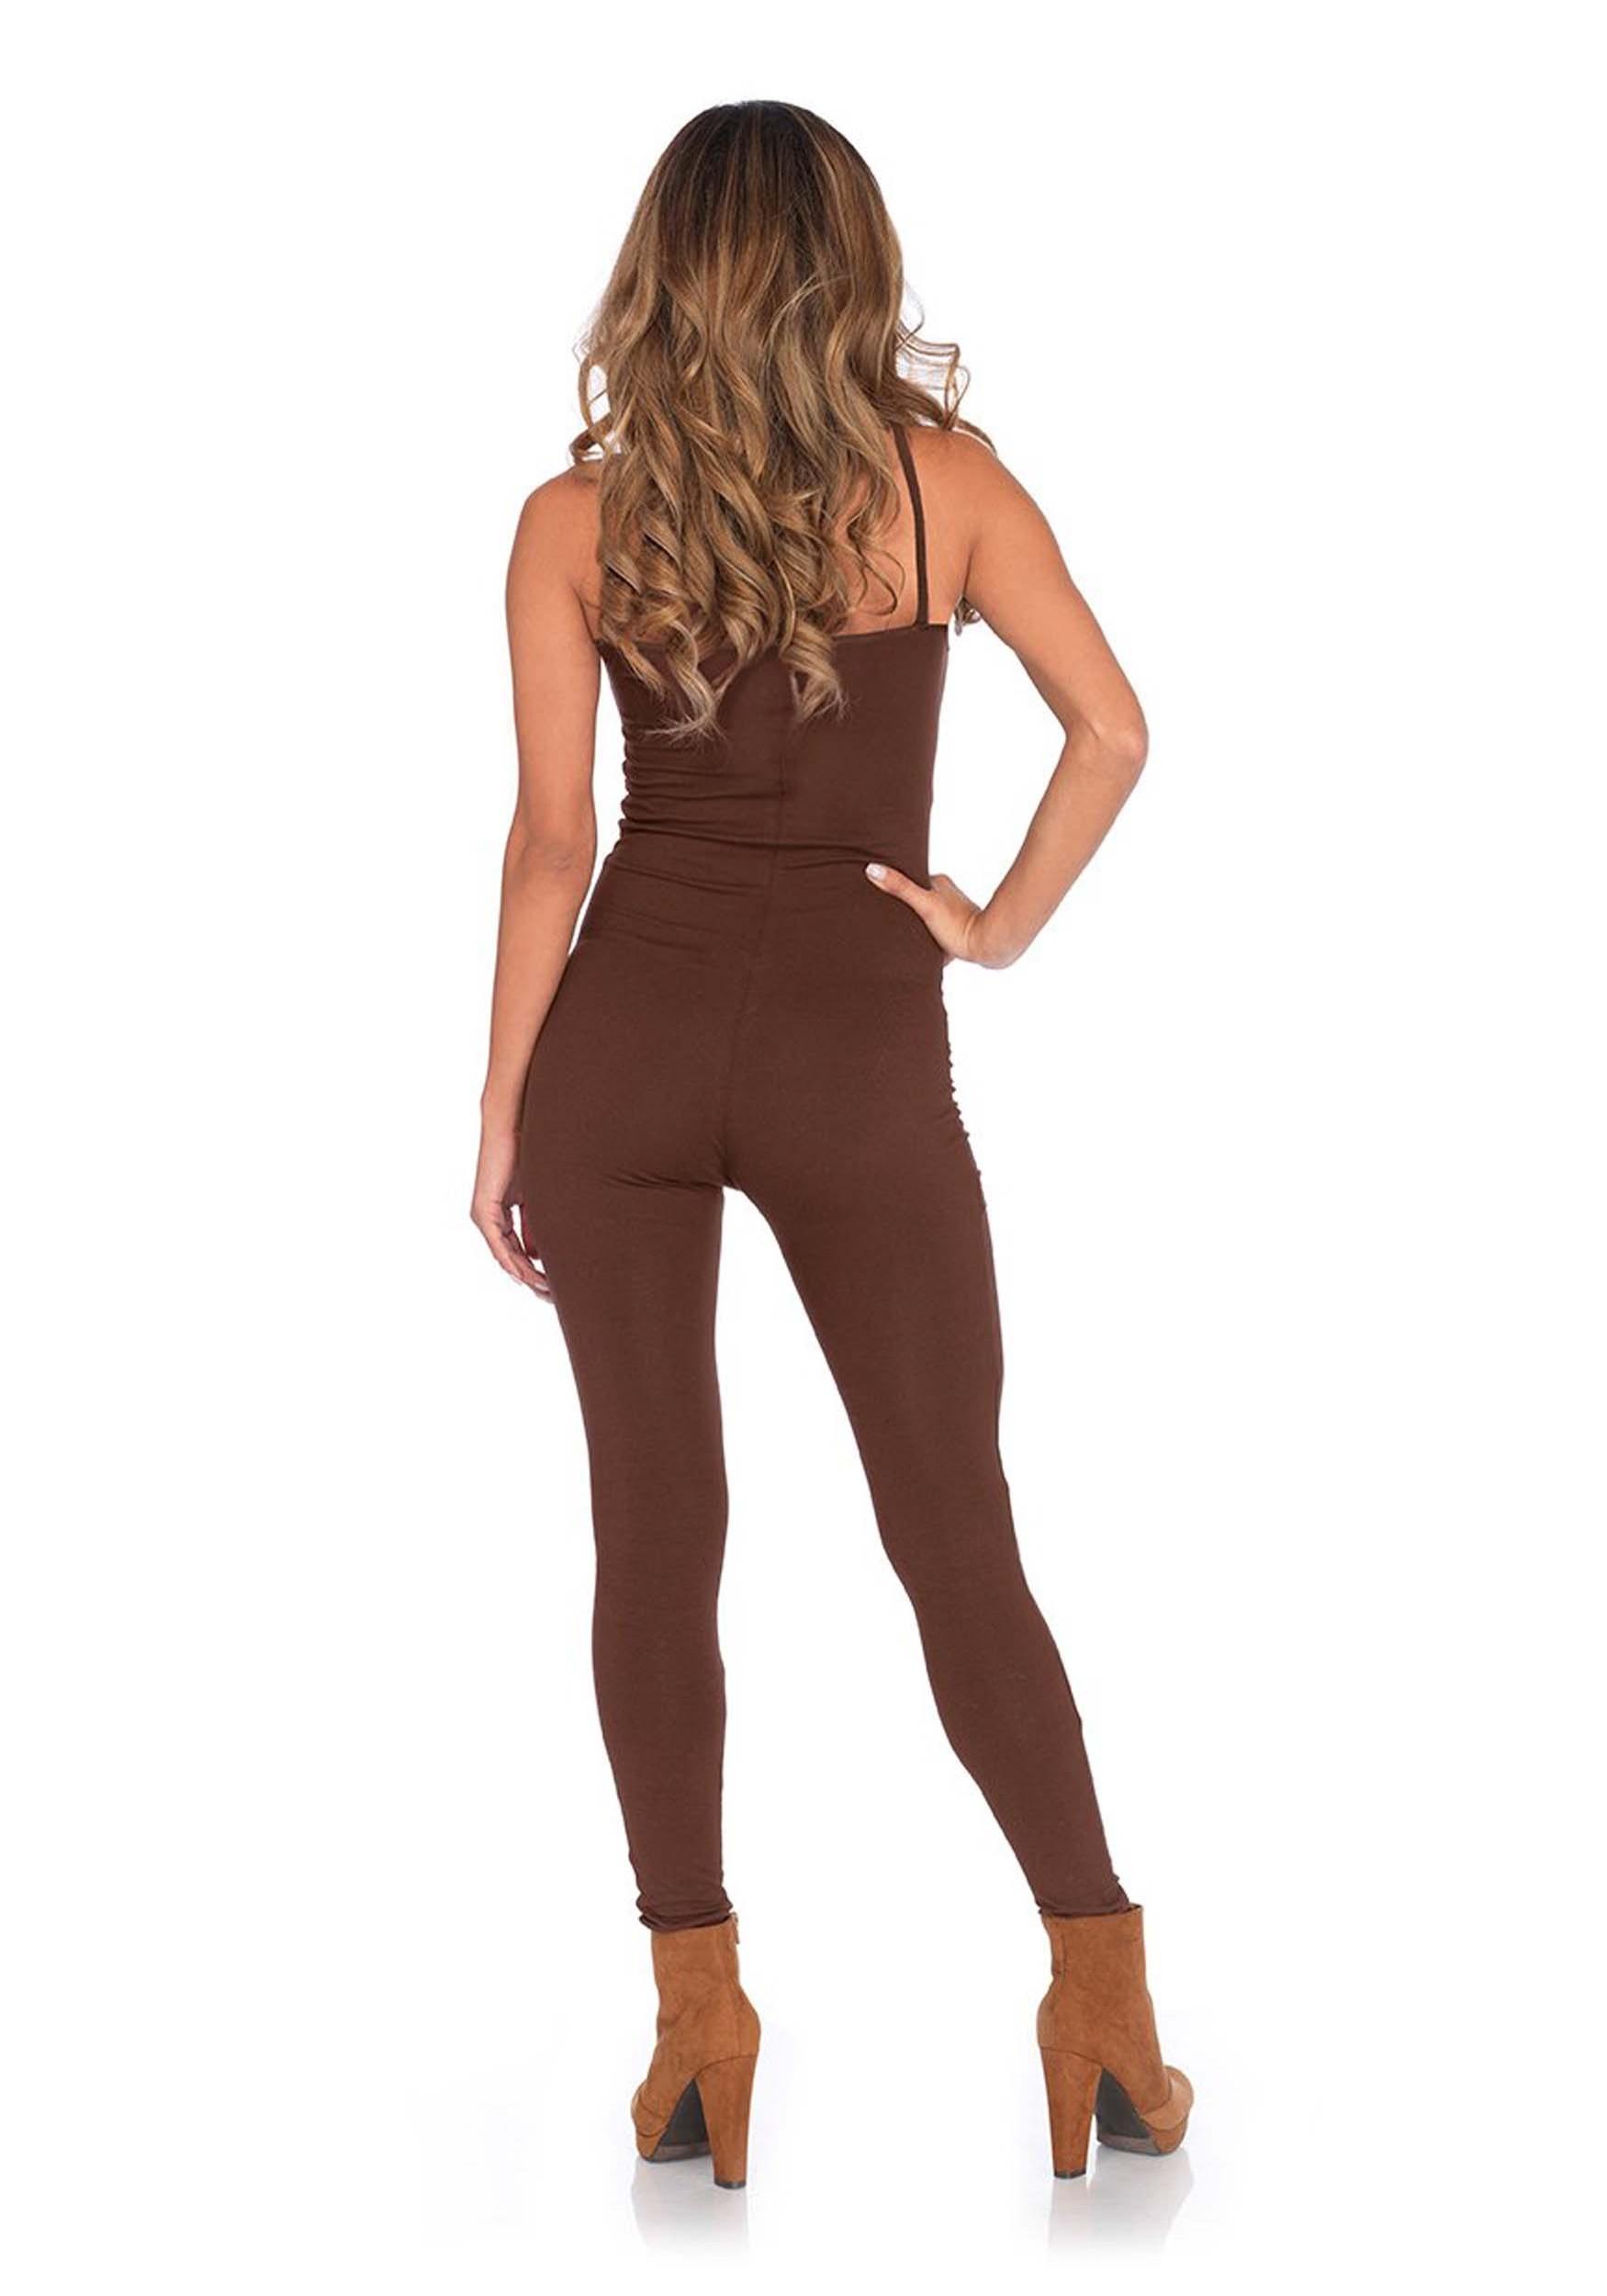 Basic Brown Unitard Costume for Women